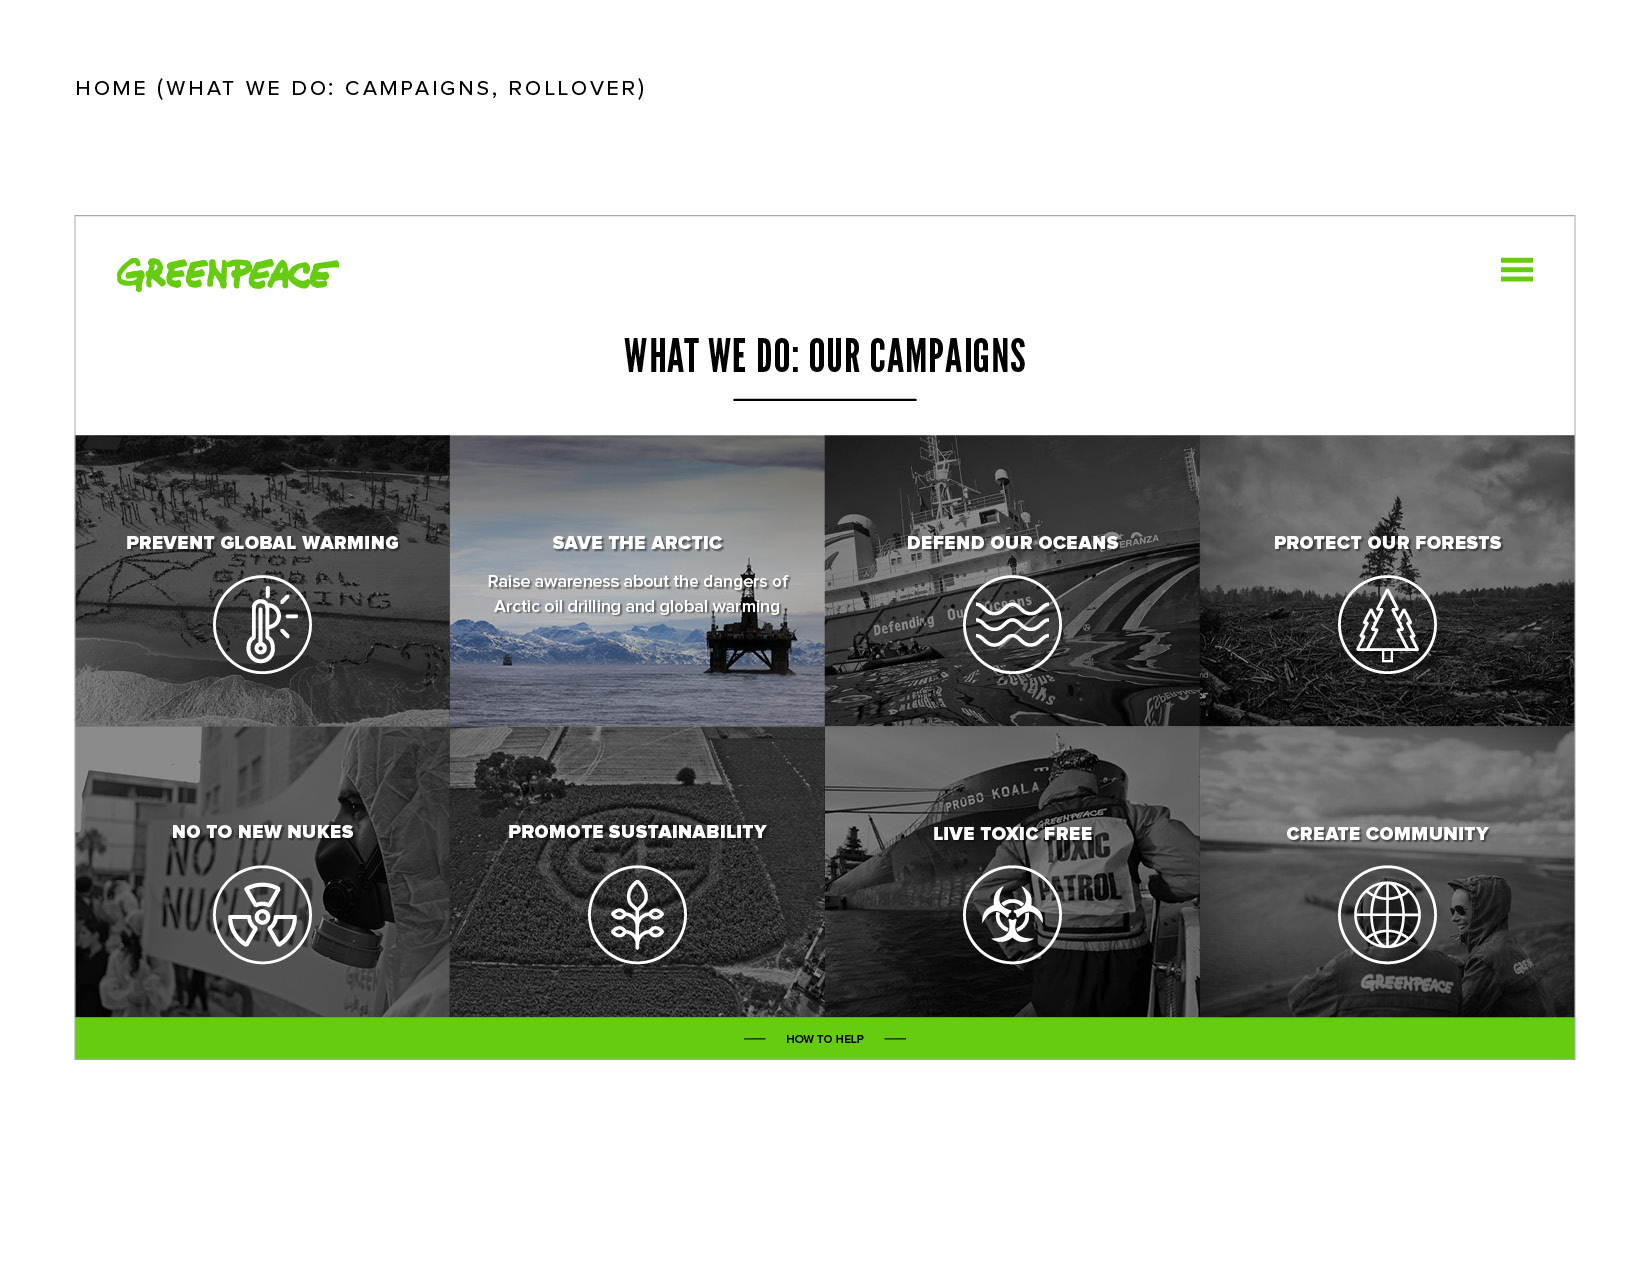 greenpeace10.jpg